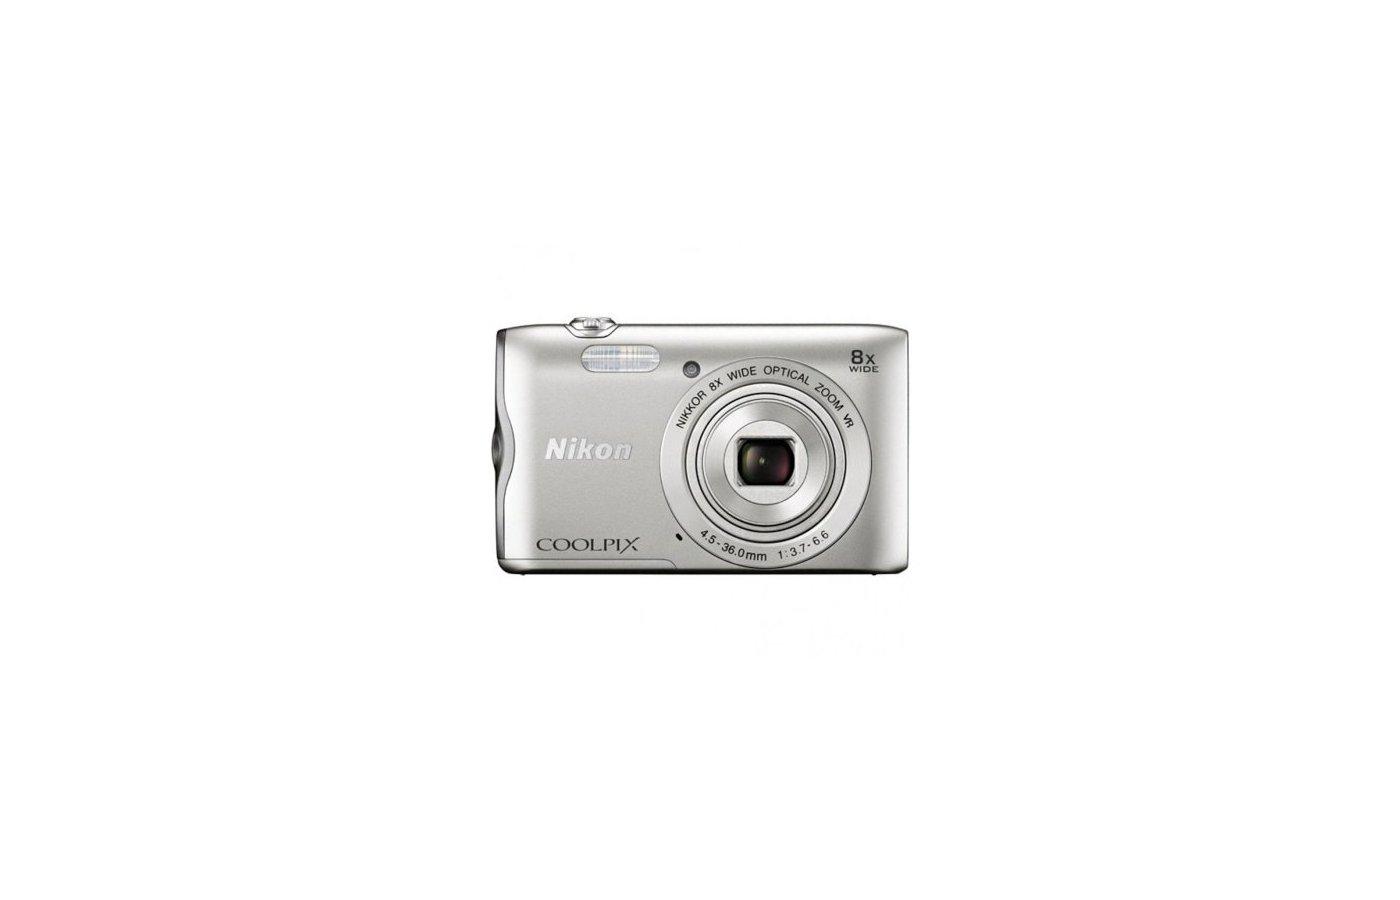 Фотоаппарат компактный Nikon Coolpix A300 silver